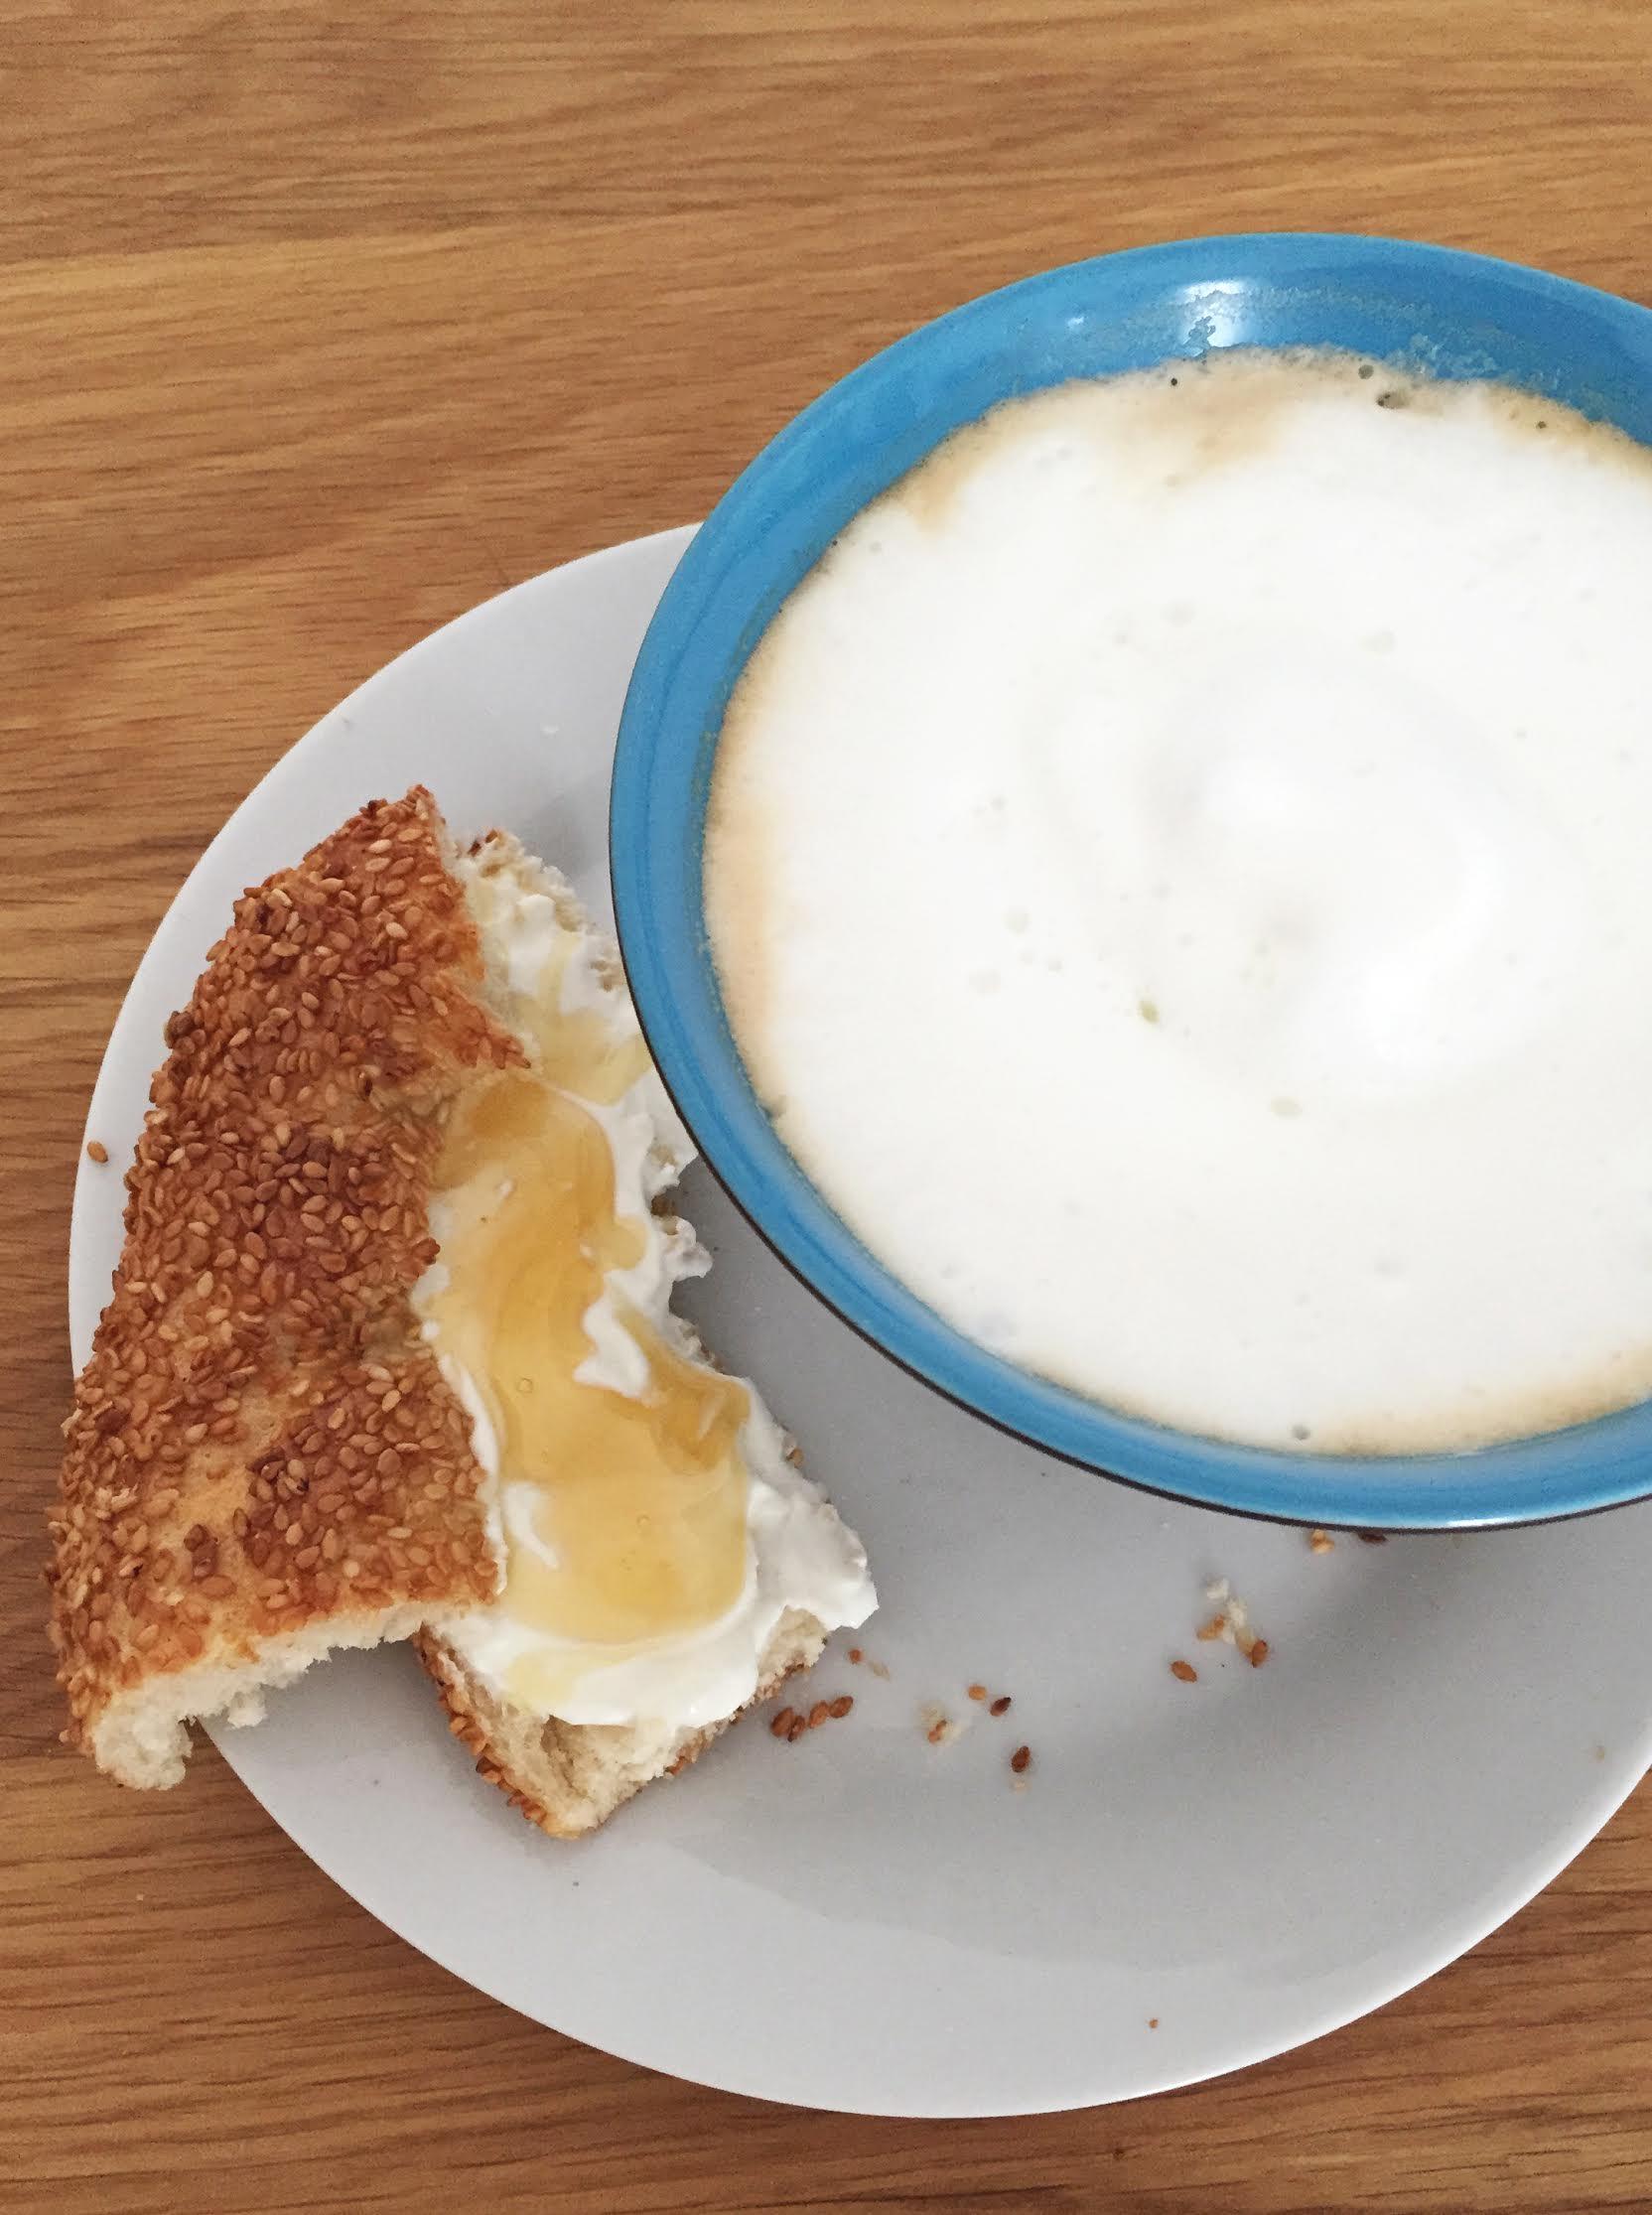 Austrian Coffee with Turkish Yogurt and Bread